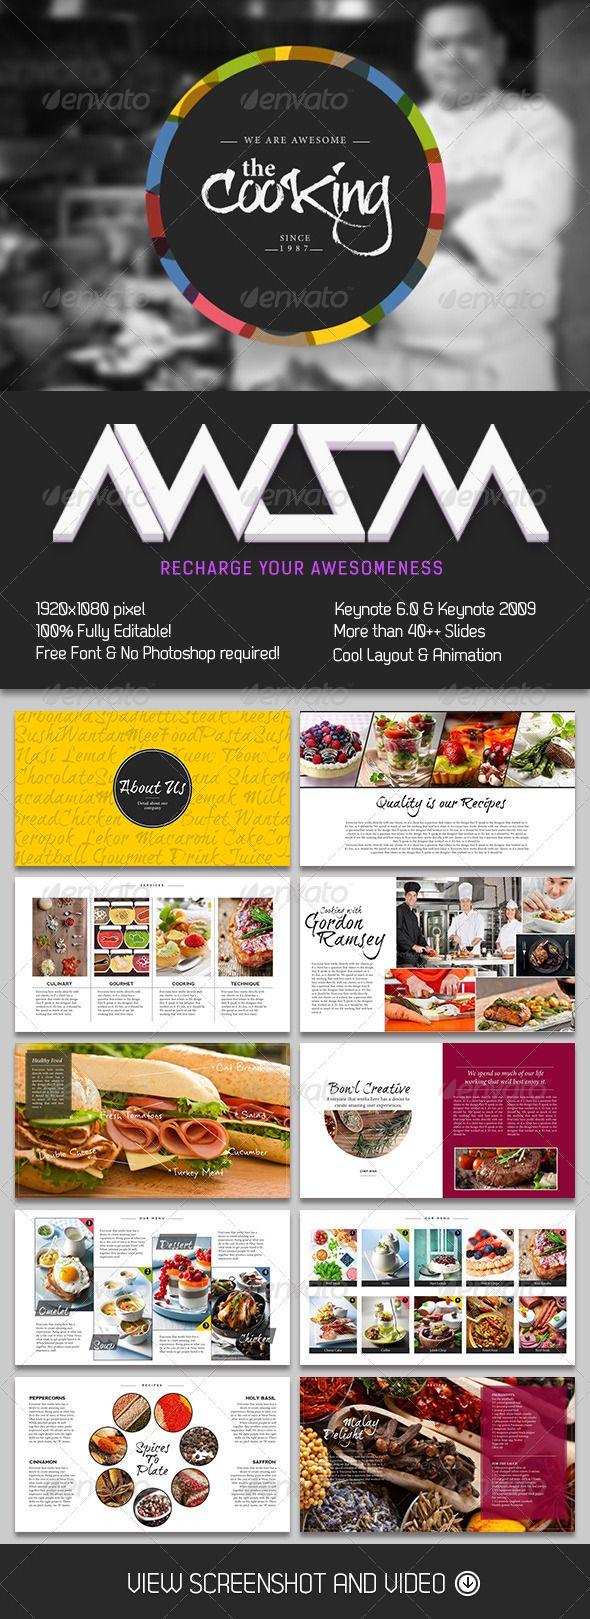 Presentation Templates - Cooking Master Keynote Template   GraphicRiver, presentation, design,